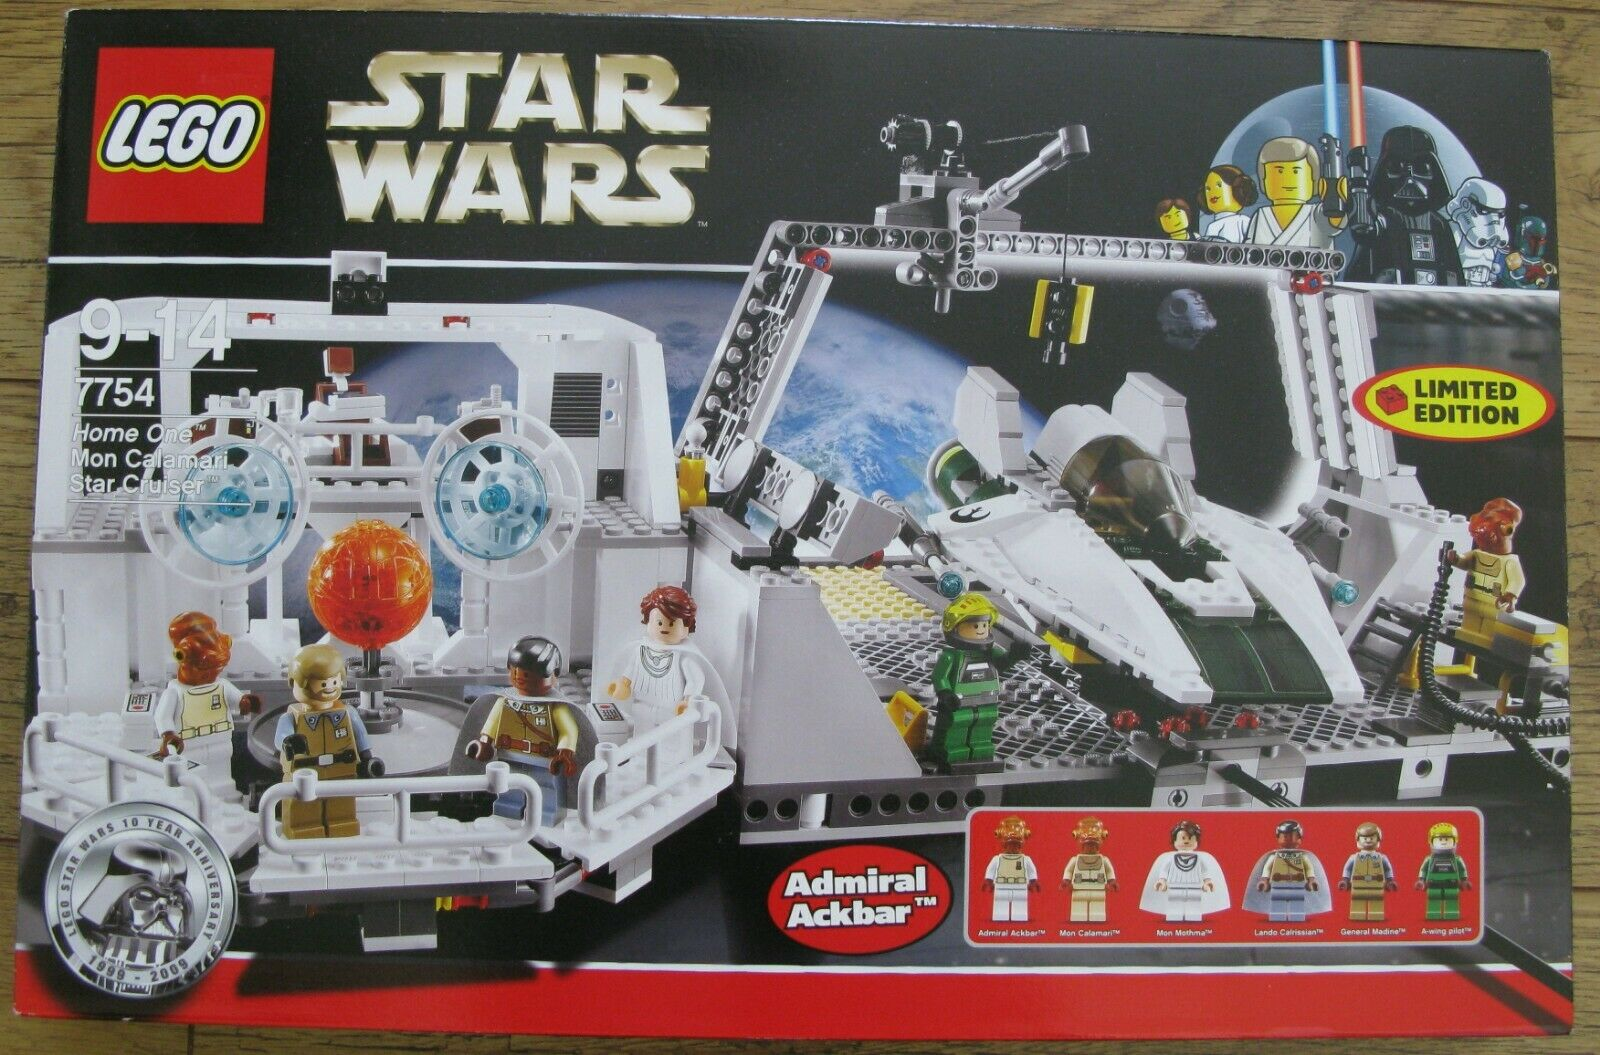 Lego 7754 Star Wars Home One Mon Calamari Star Cruiser 100% complete